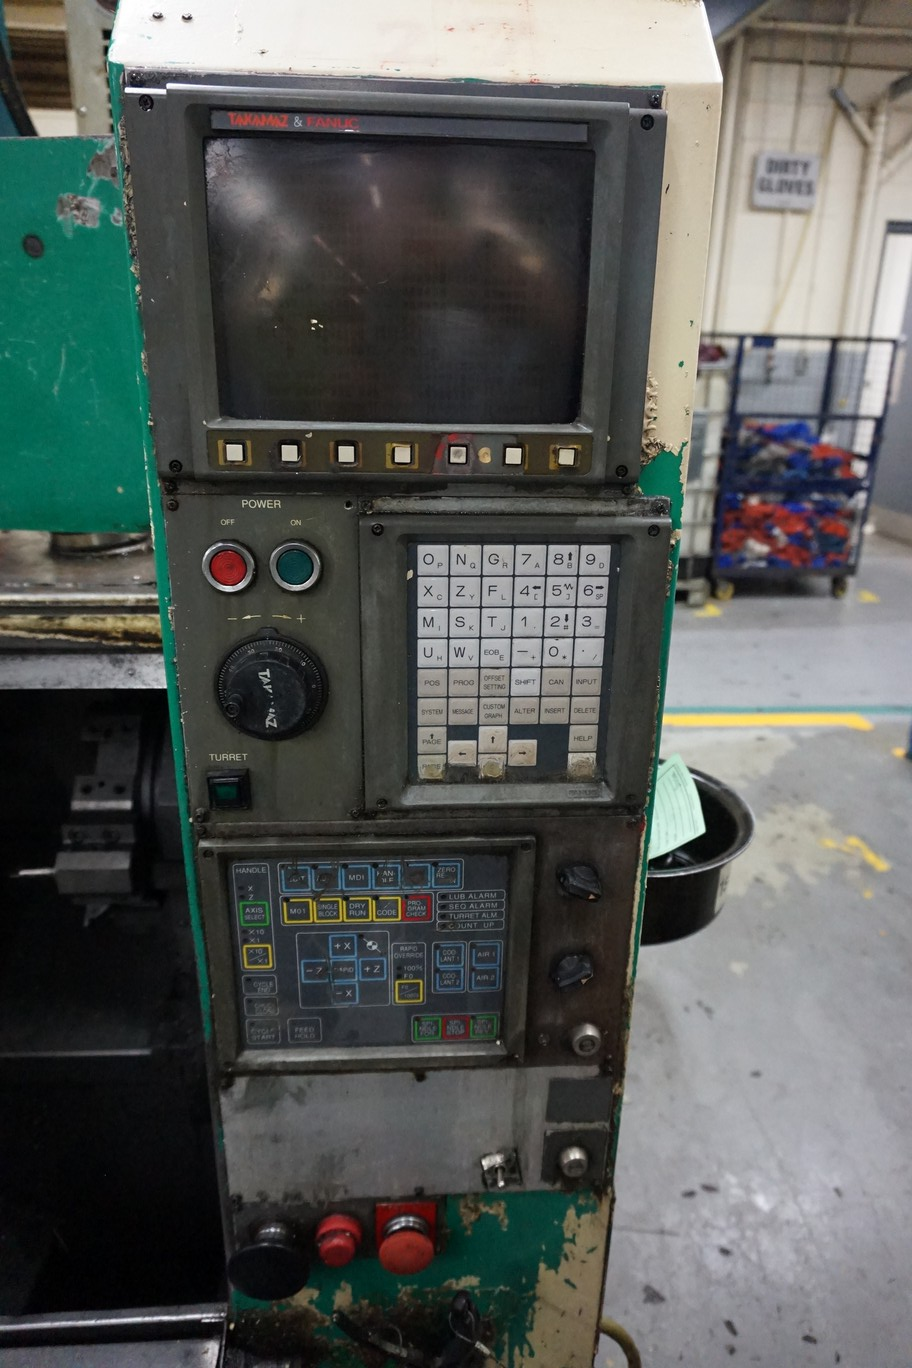 Takamatsu Model X10 CNC Lathe 200/220V c/w Chip Conveyor, Transformer - Image 2 of 5